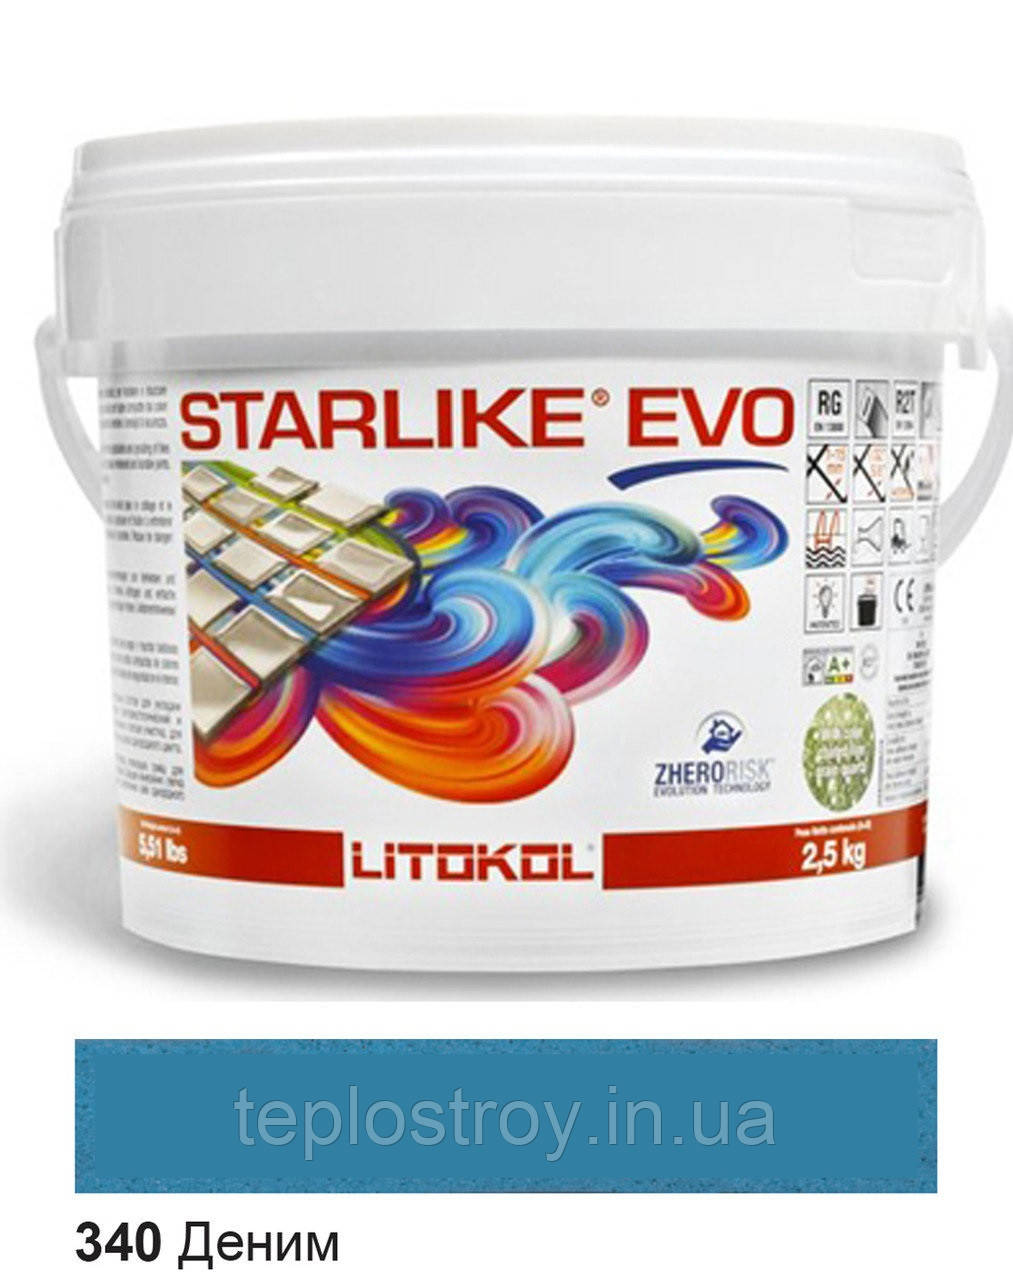 Епоксидна затирка Starlike EVO GLAM COLLECTION 340 (Денім) 2.5 кг